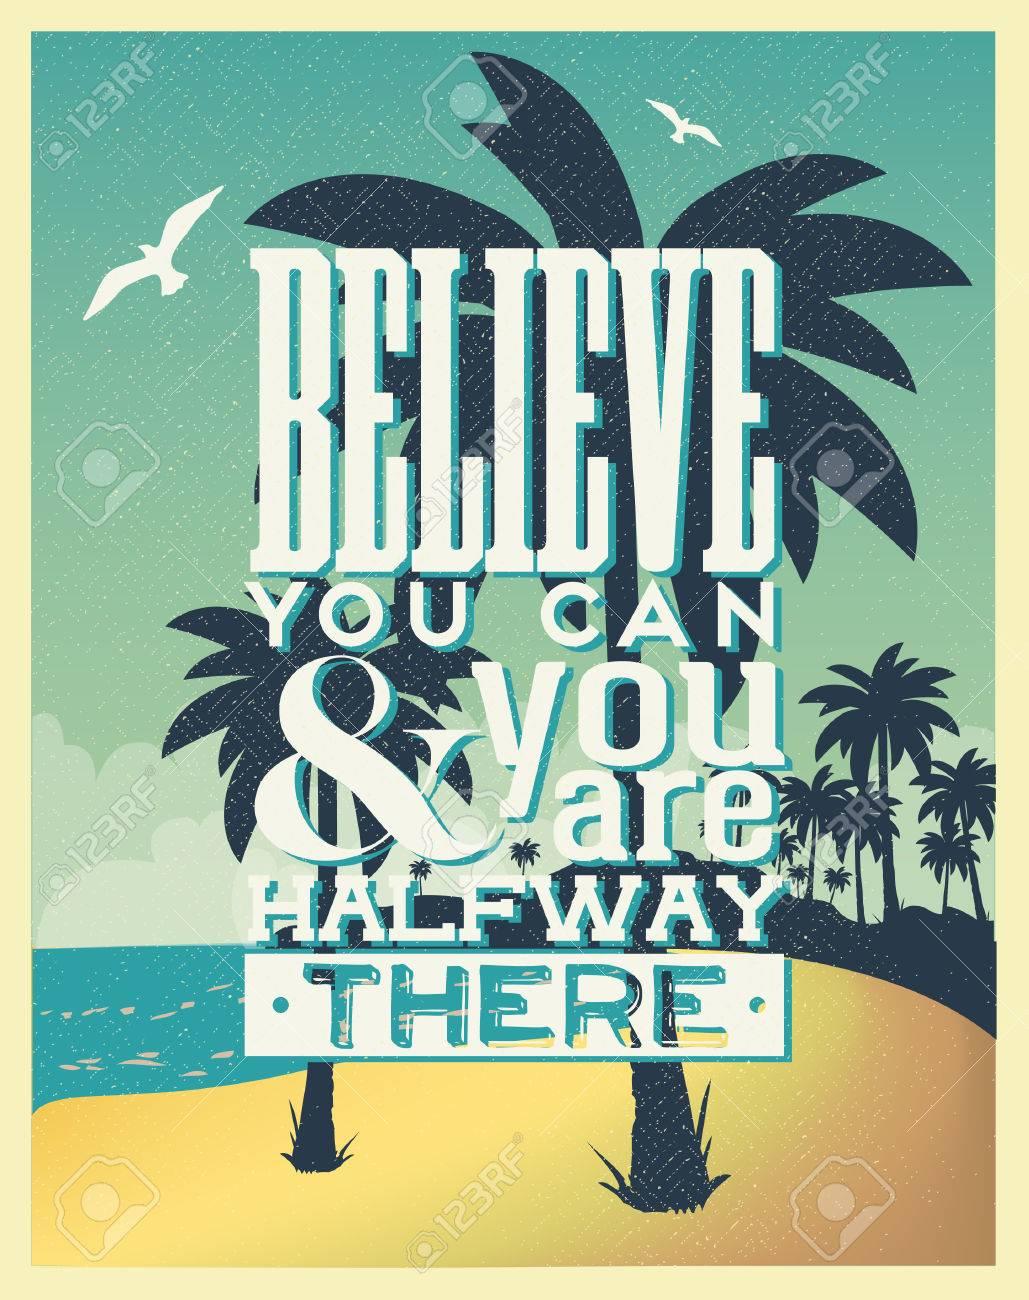 Design poster retro - Retro Vintage Summer Poster Design With Typography Stock Vector 23763396